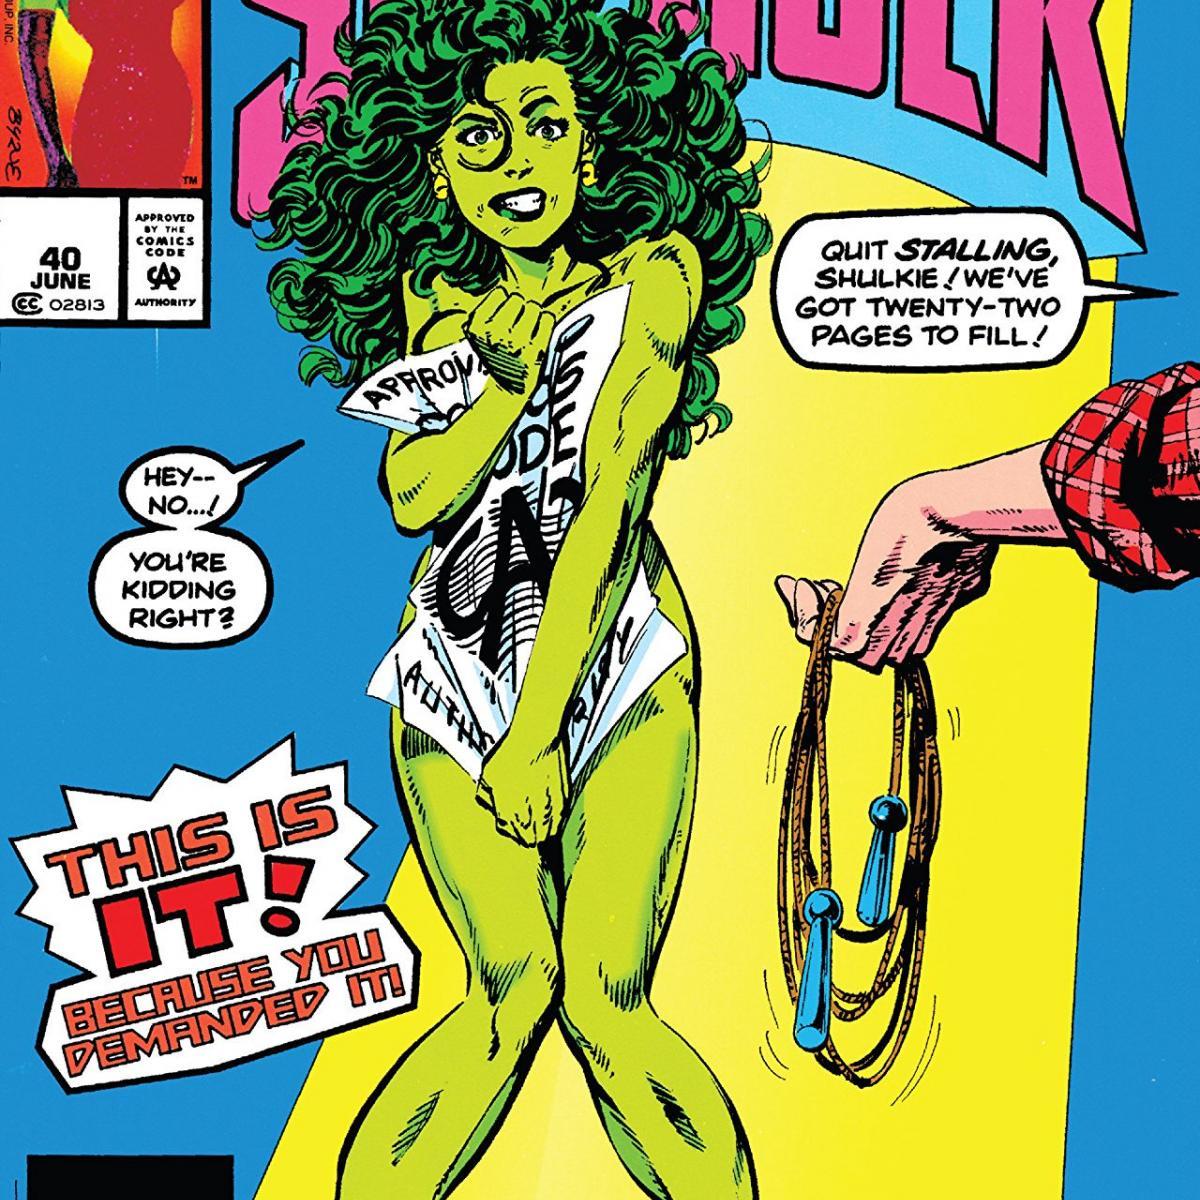 Image of She-Hulk comic cover